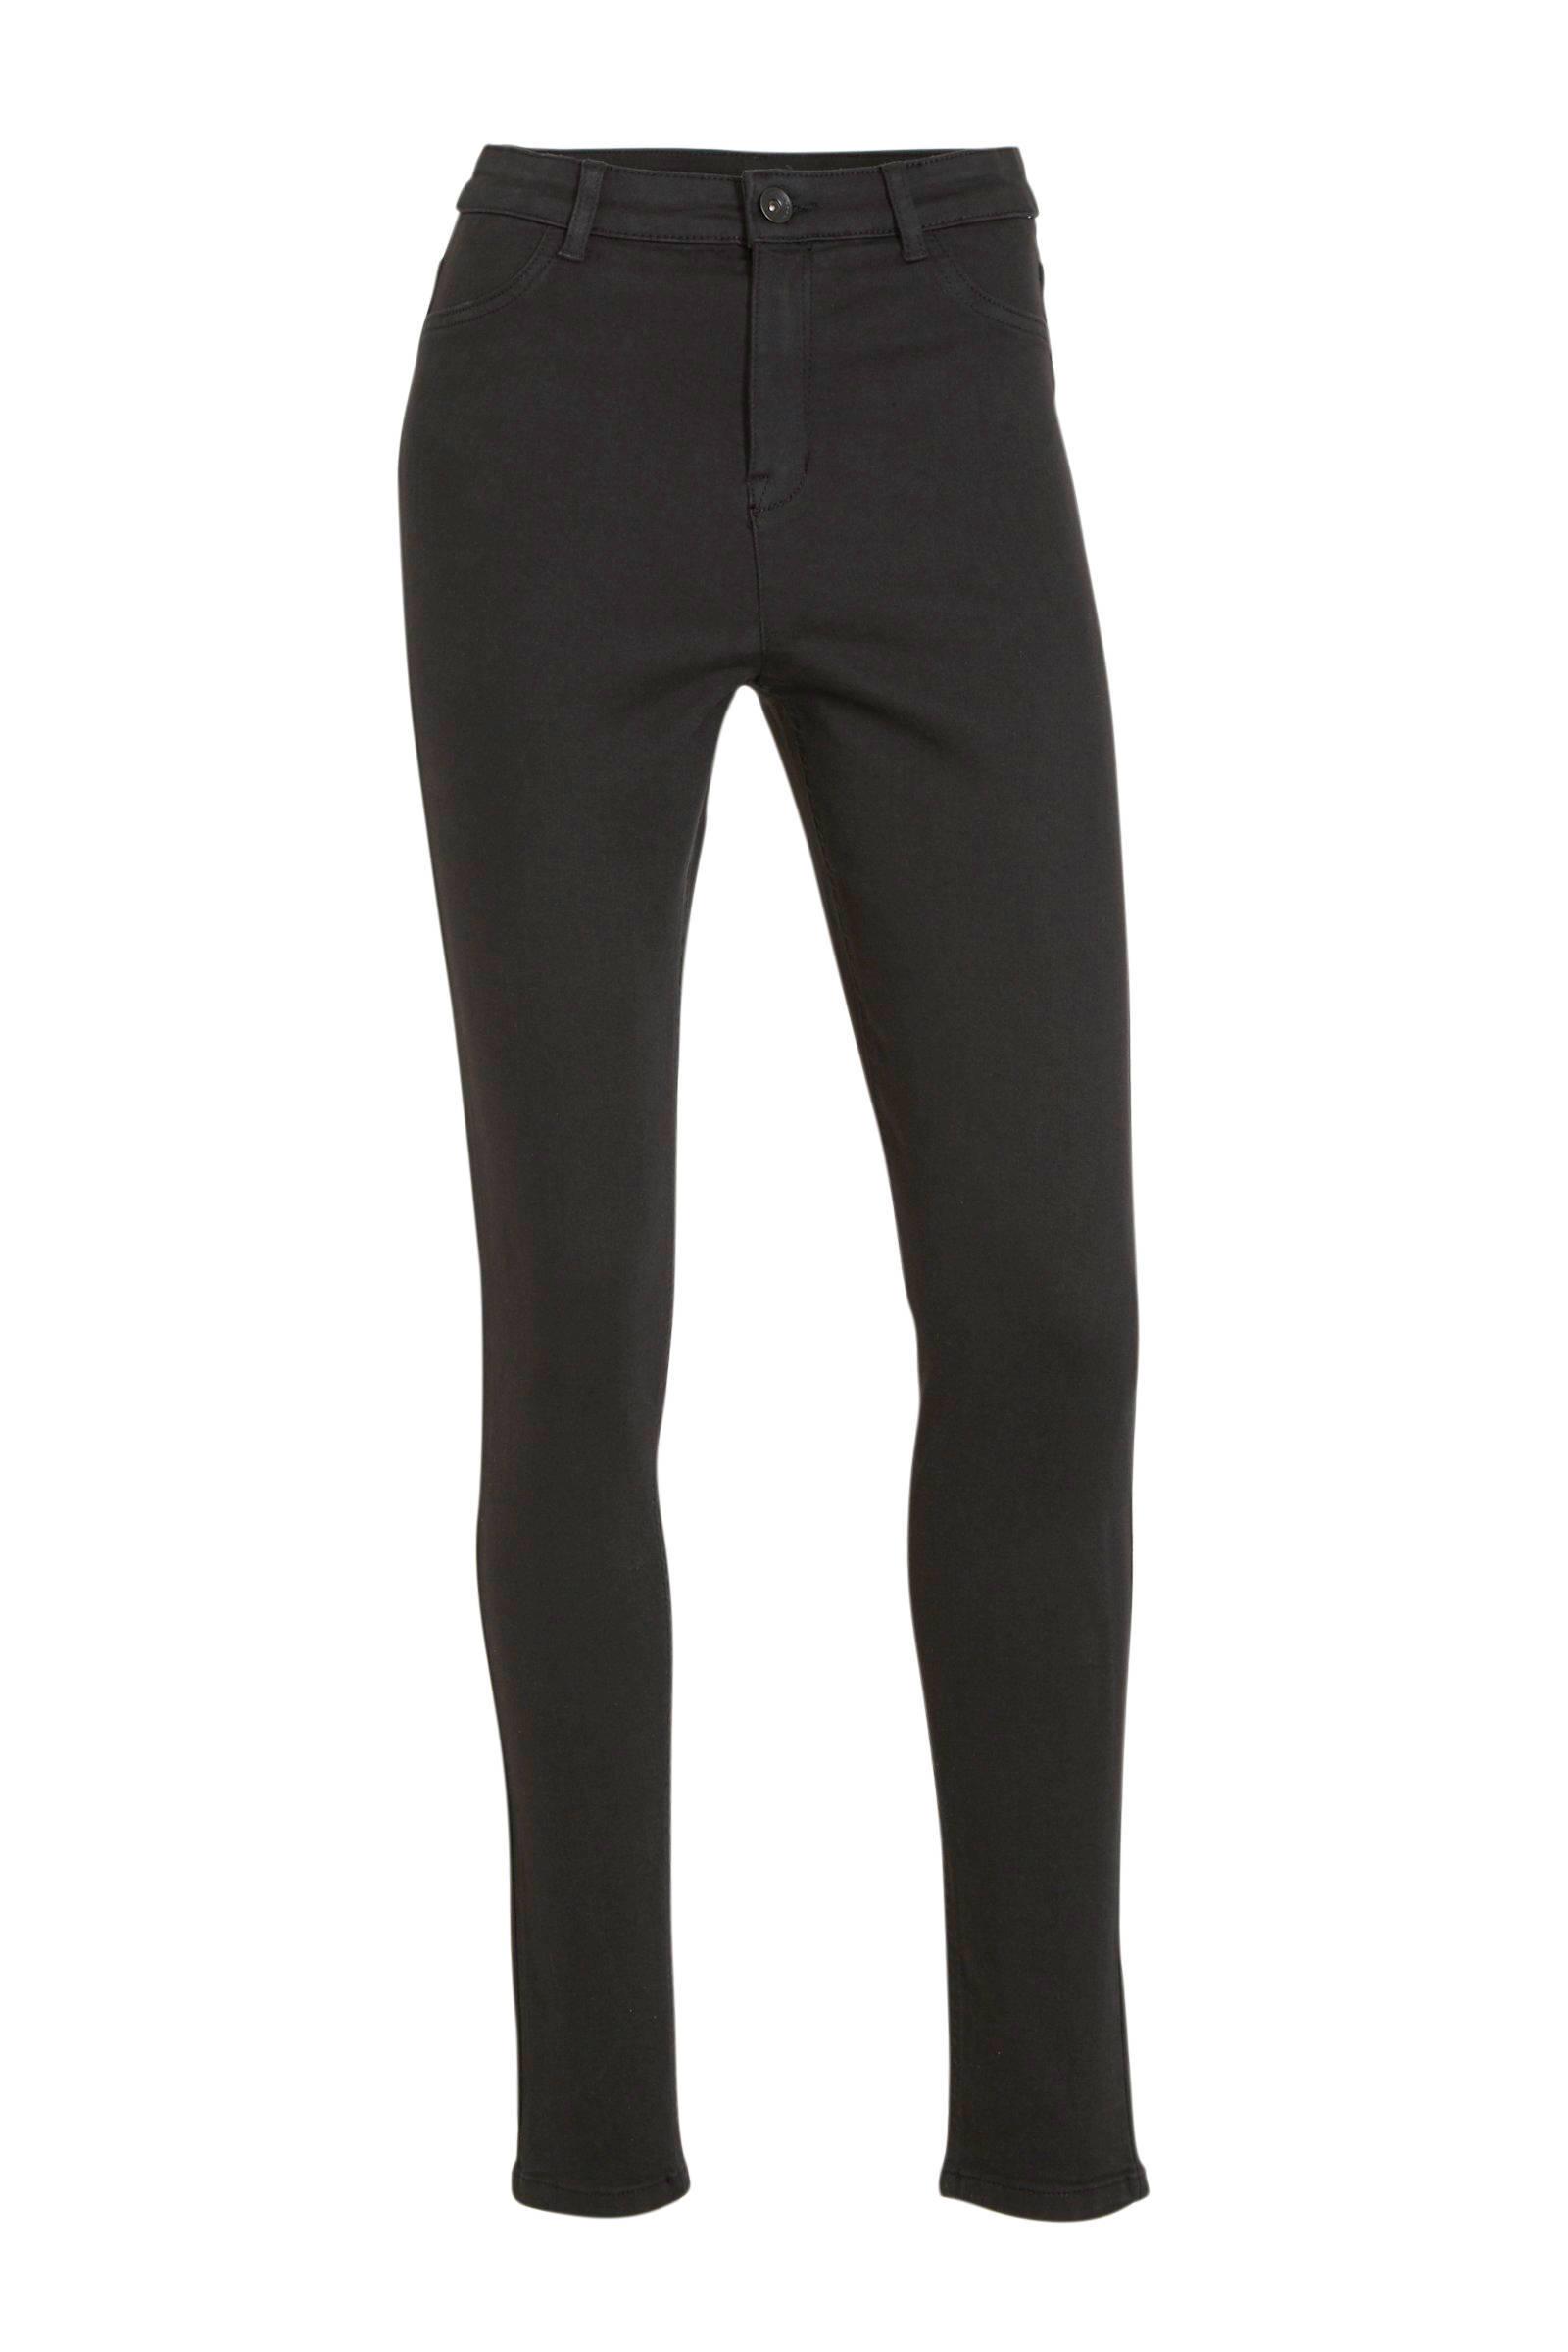 MAC dames jeans bij wehkamp Gratis bezorging vanaf 20.